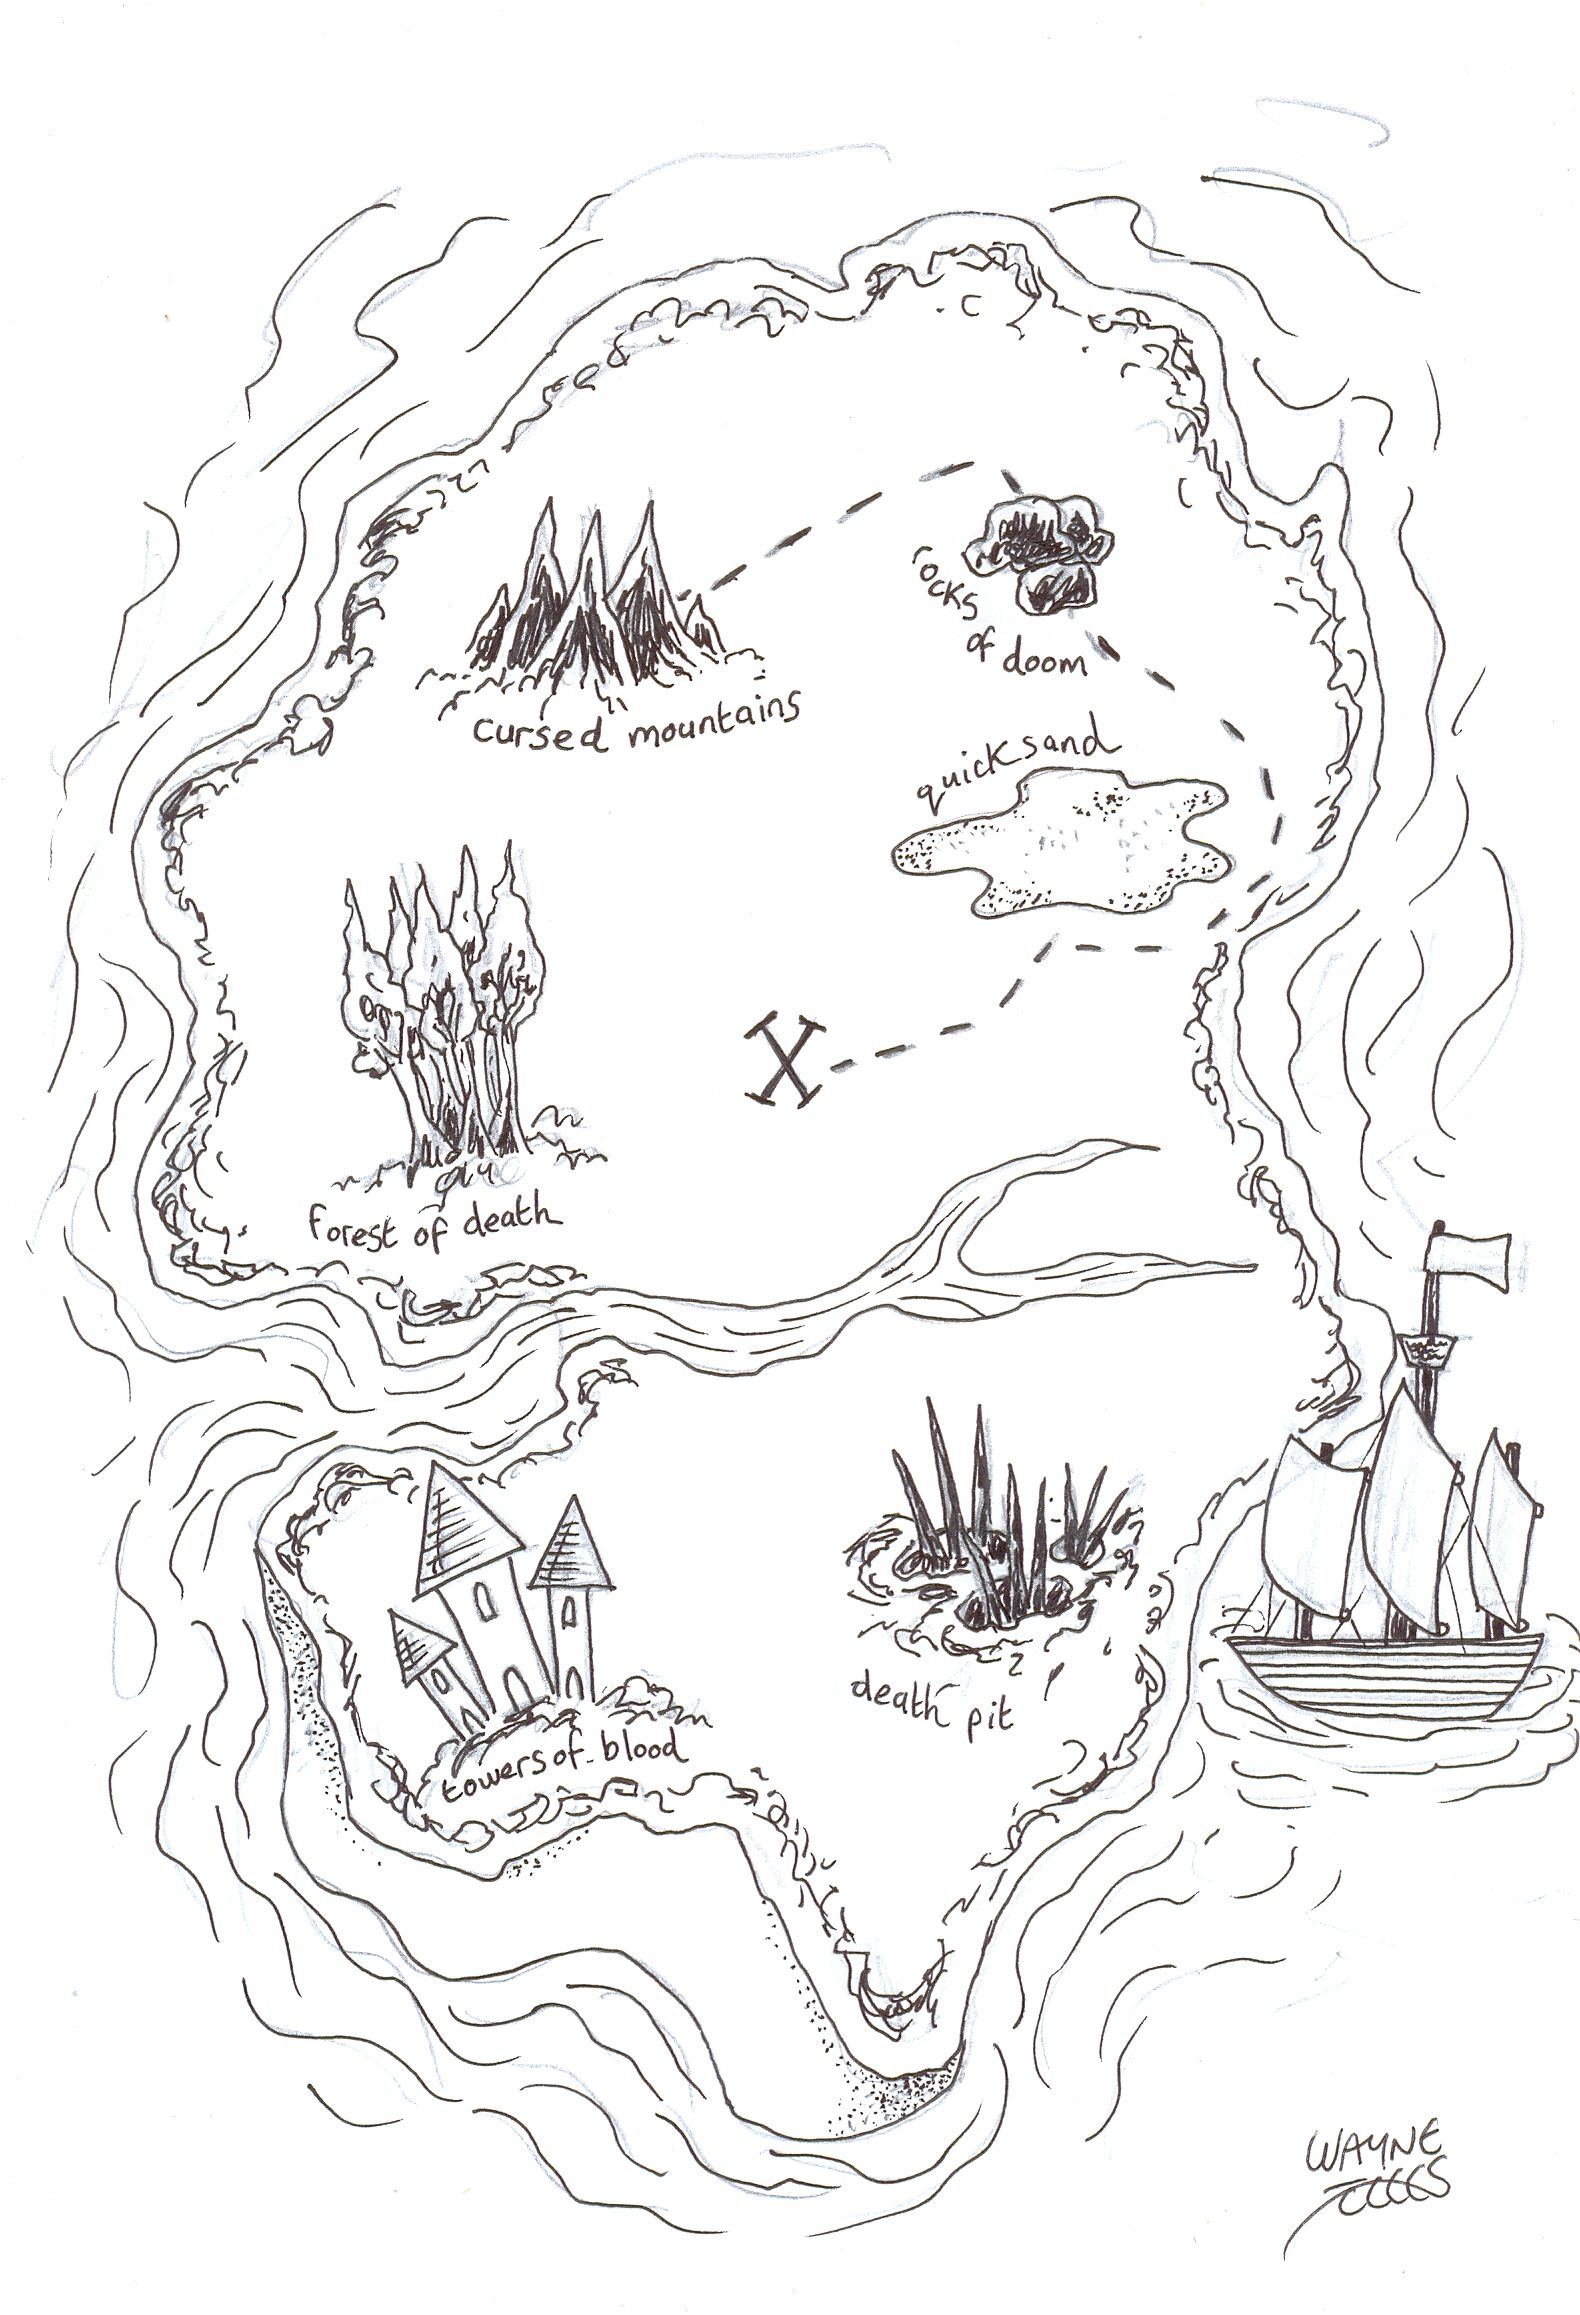 How To Draw A Pirate Treasure Map Pirate treasure maps